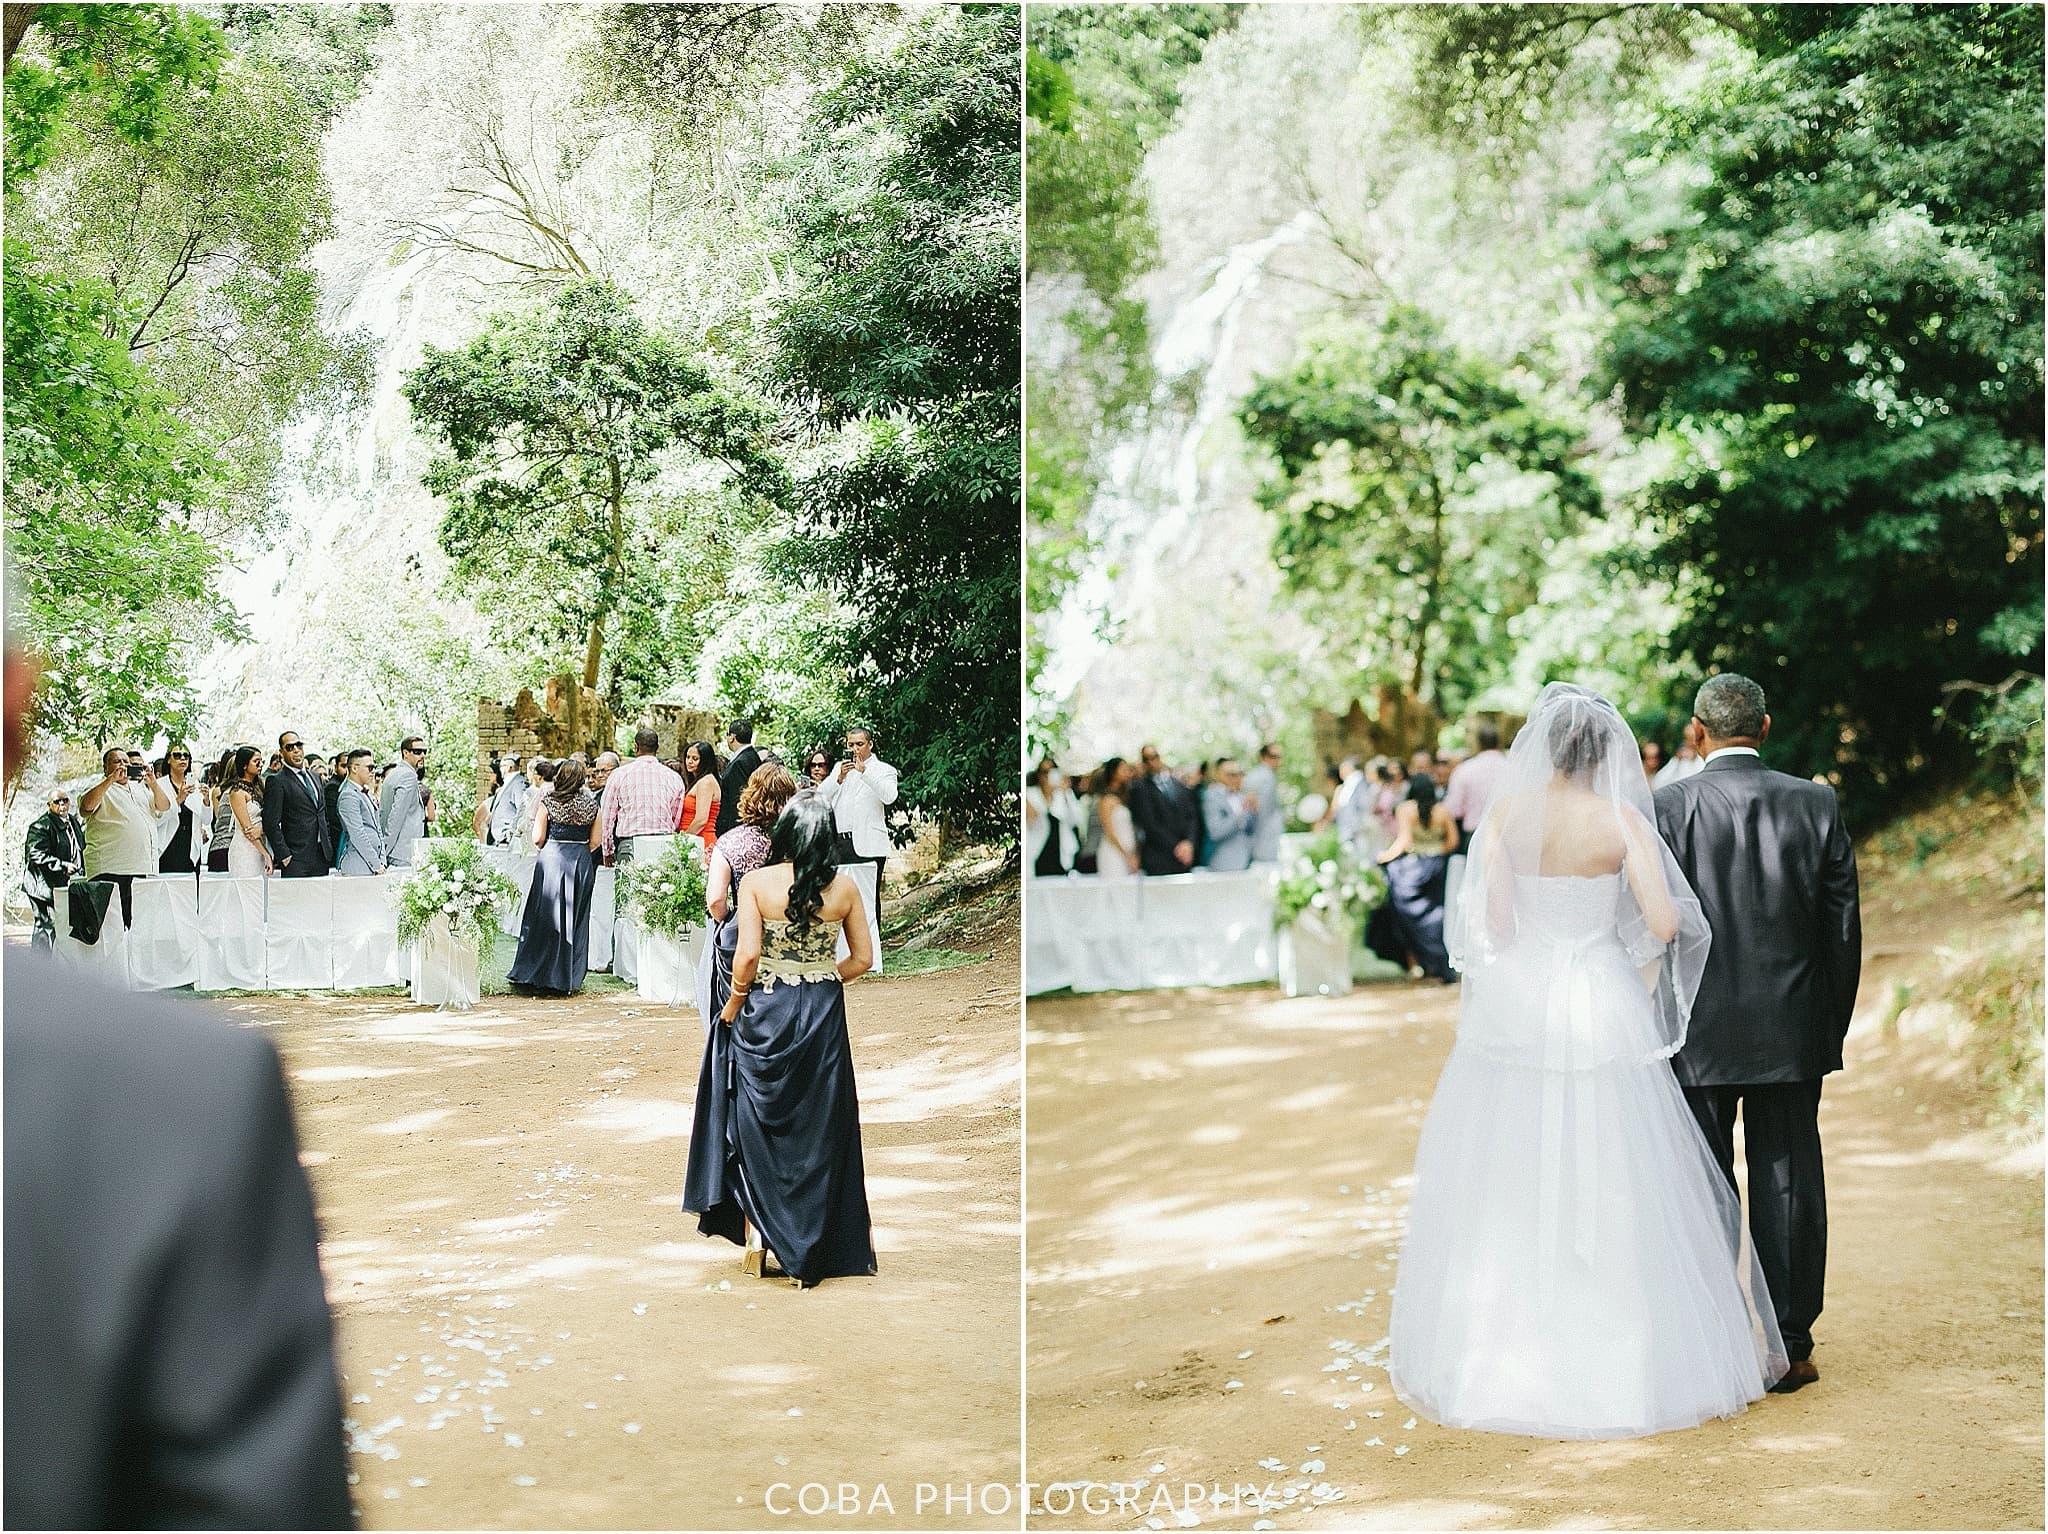 Marc&Melissa - Cascade Manor - Coba Photography (102)